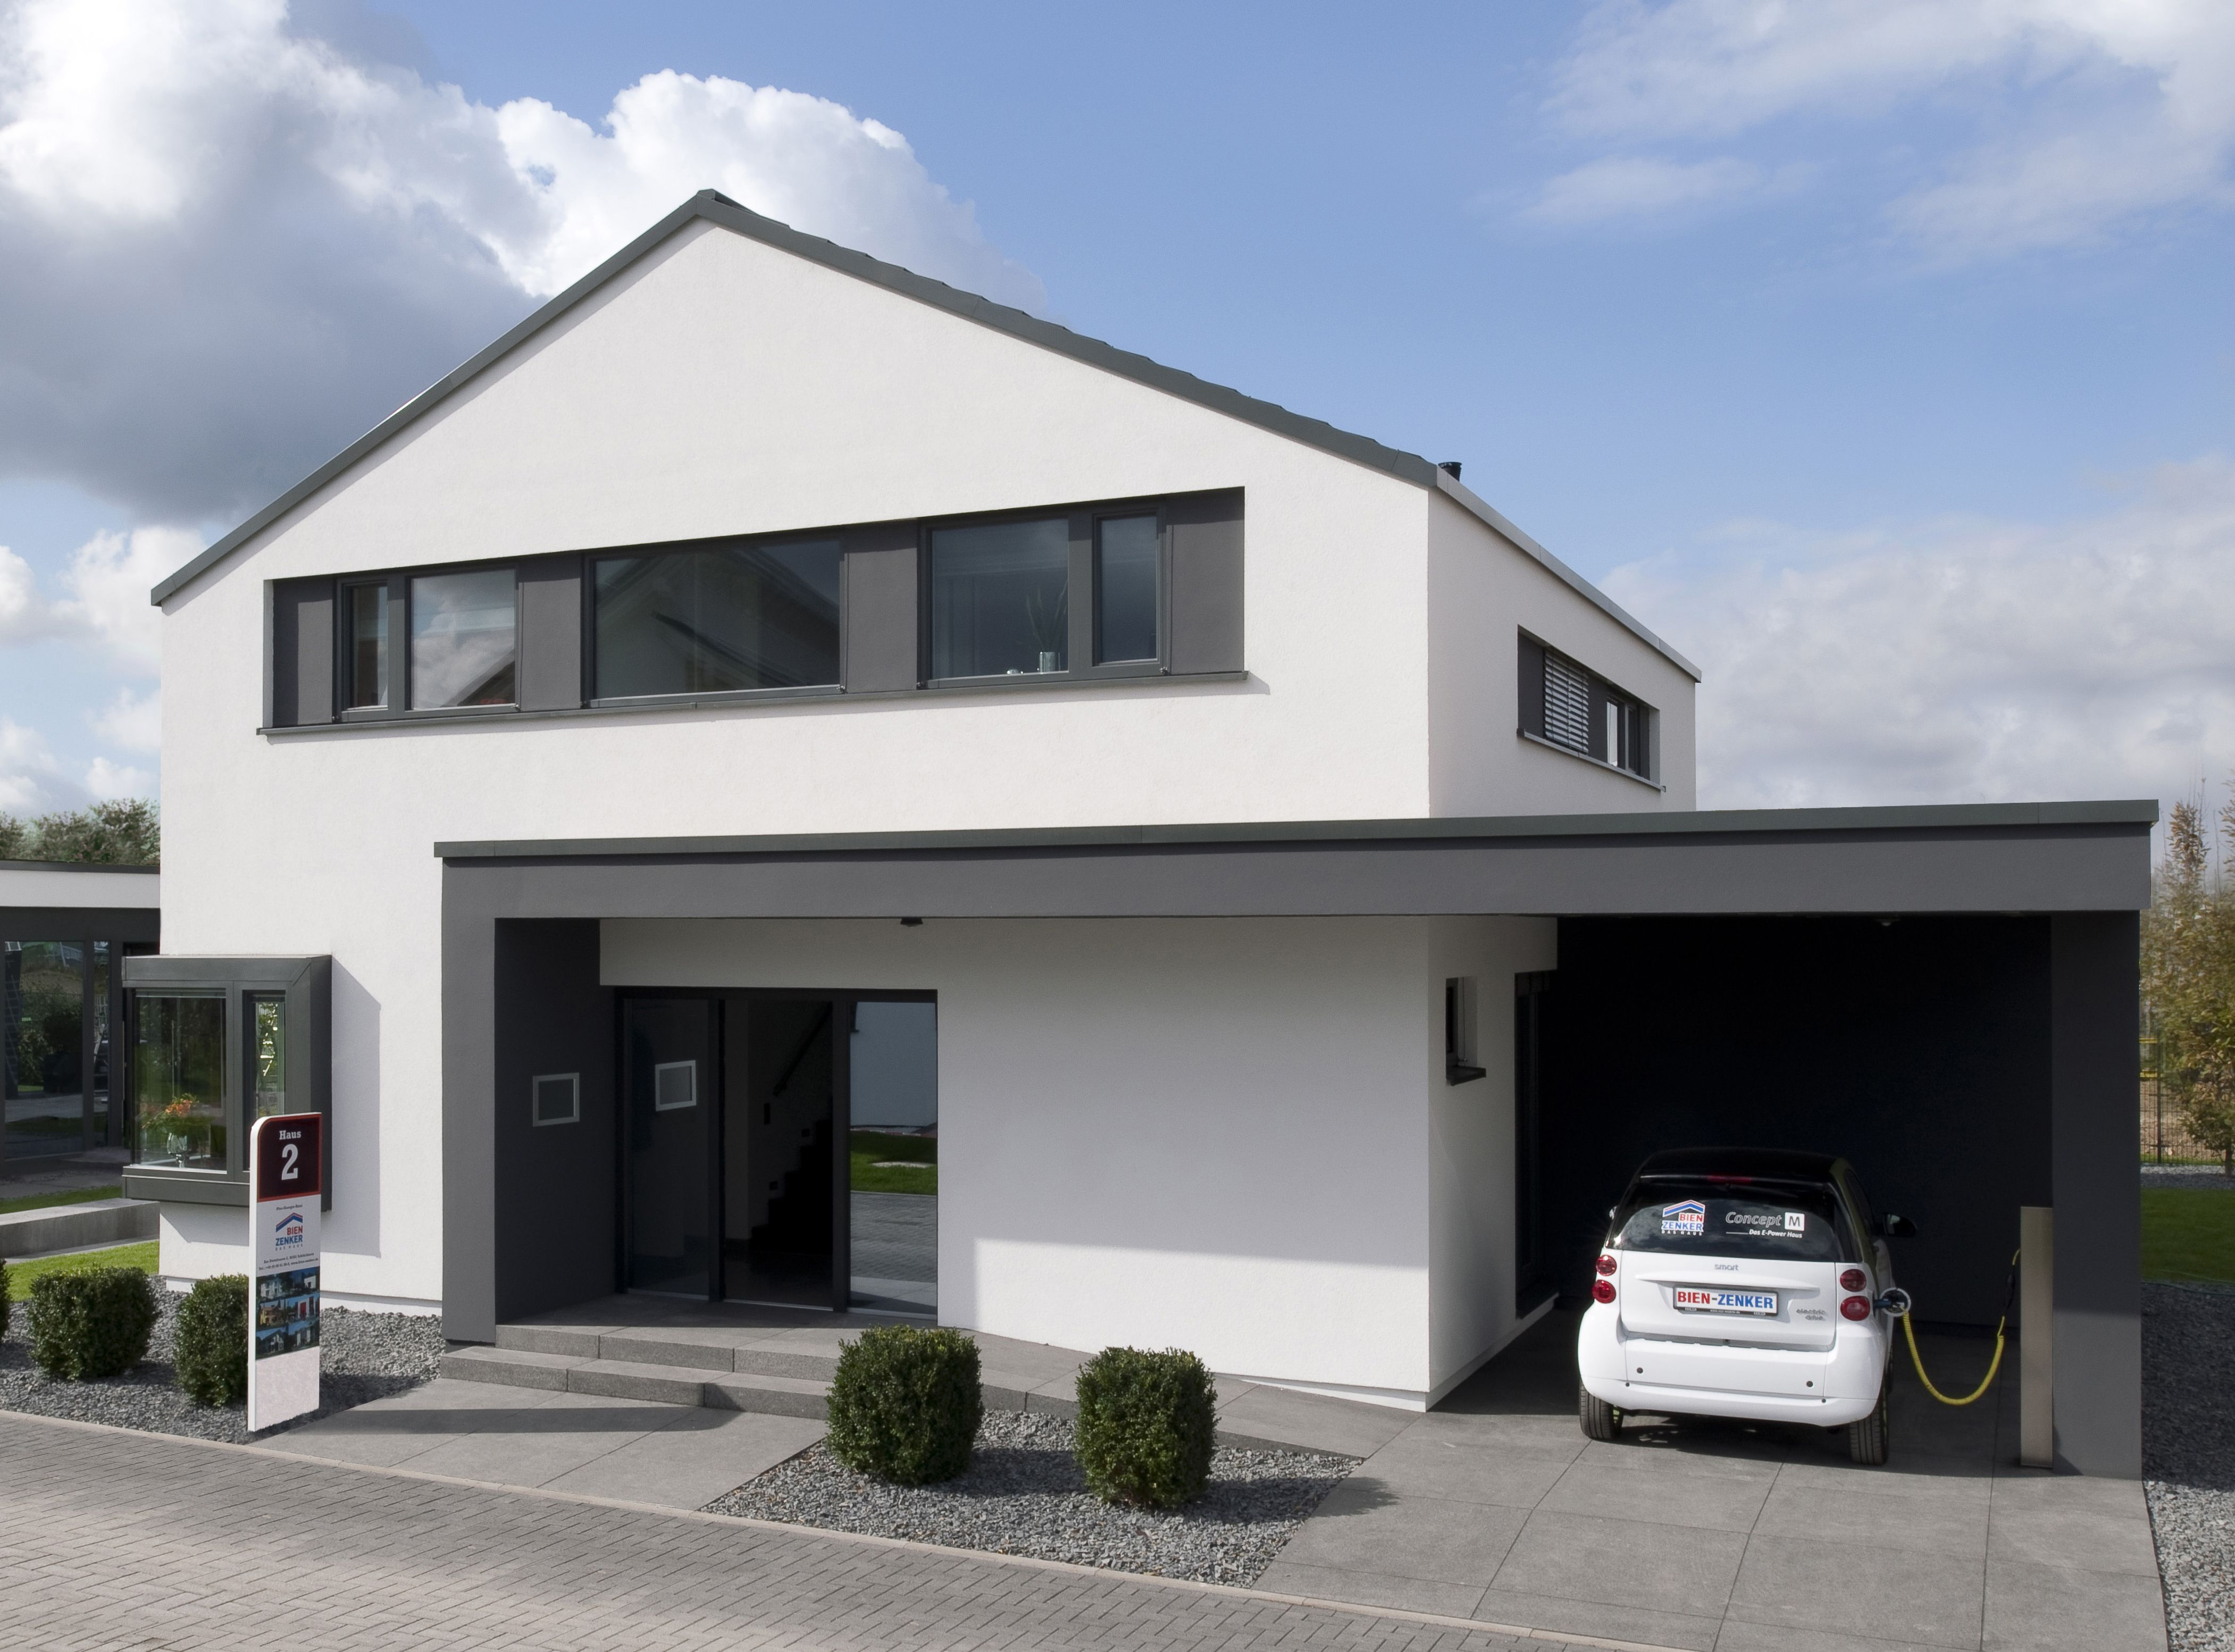 Vorgarten | Hauseingang / Vorgarten | Pinterest | Pergolas, Haus and ...